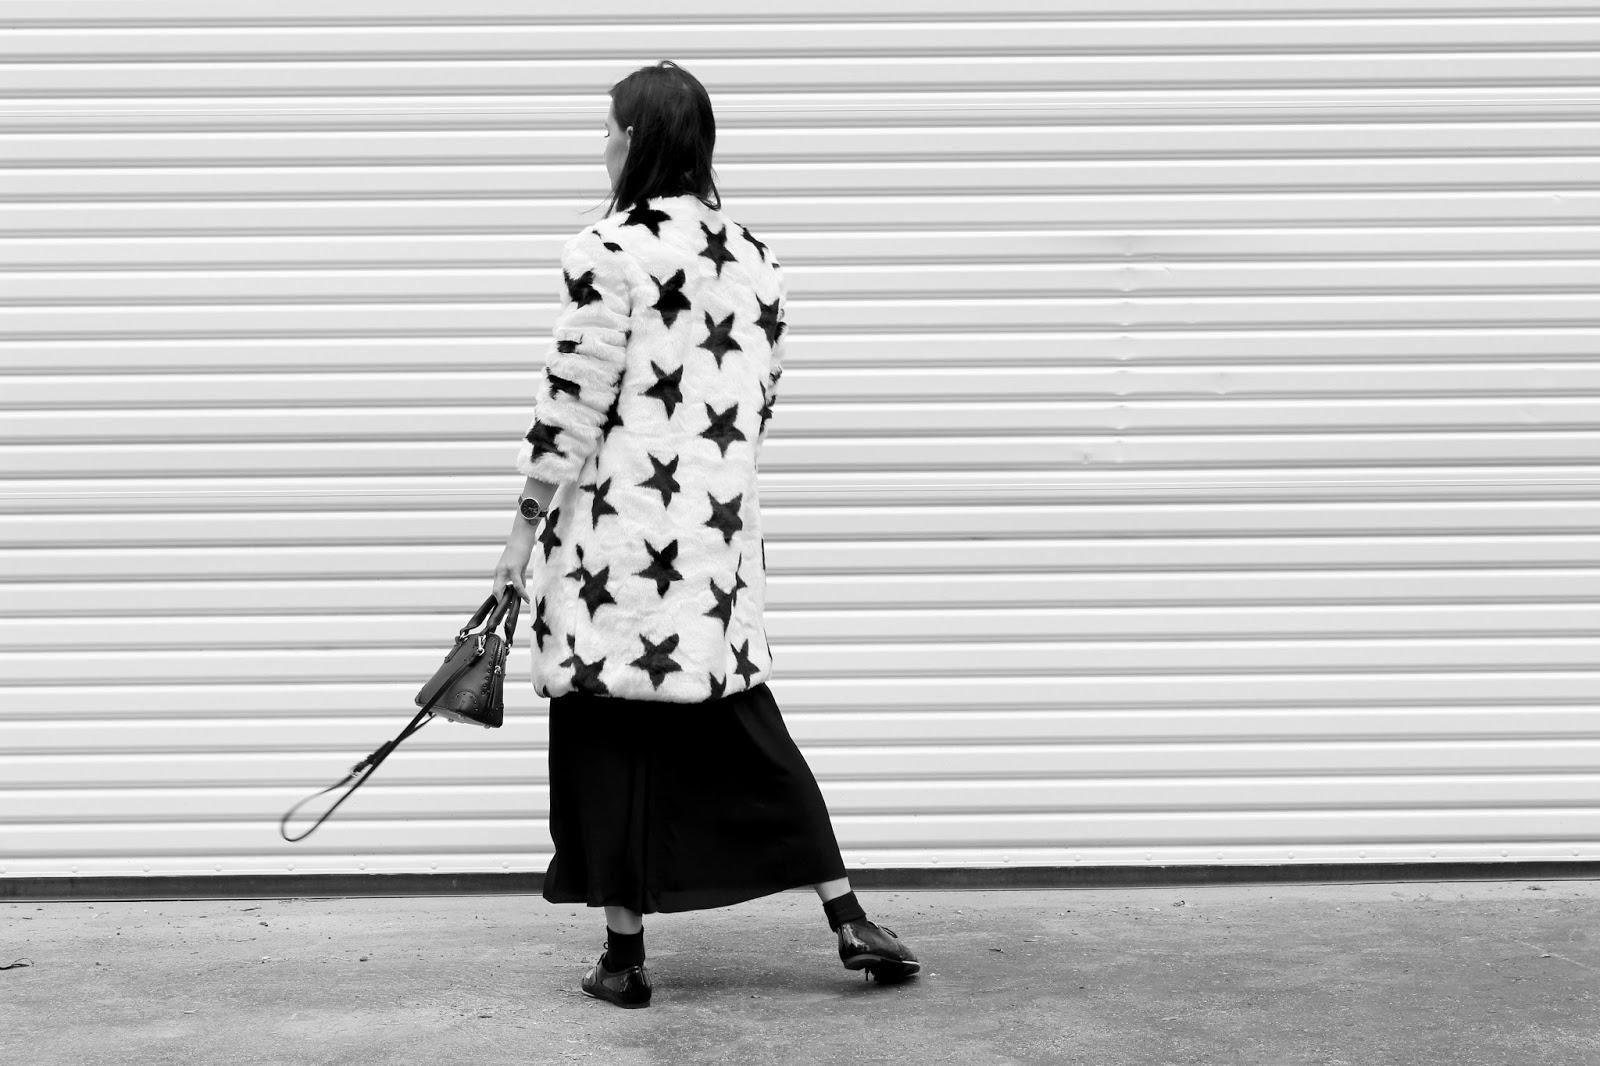 slip dress, spring 2016, street style, spring outfit, faux fur jacket, star print, star jacket, loafers, socks and heels, socks and loafers, mules, mini bag, pajama dressing, tourdestfu